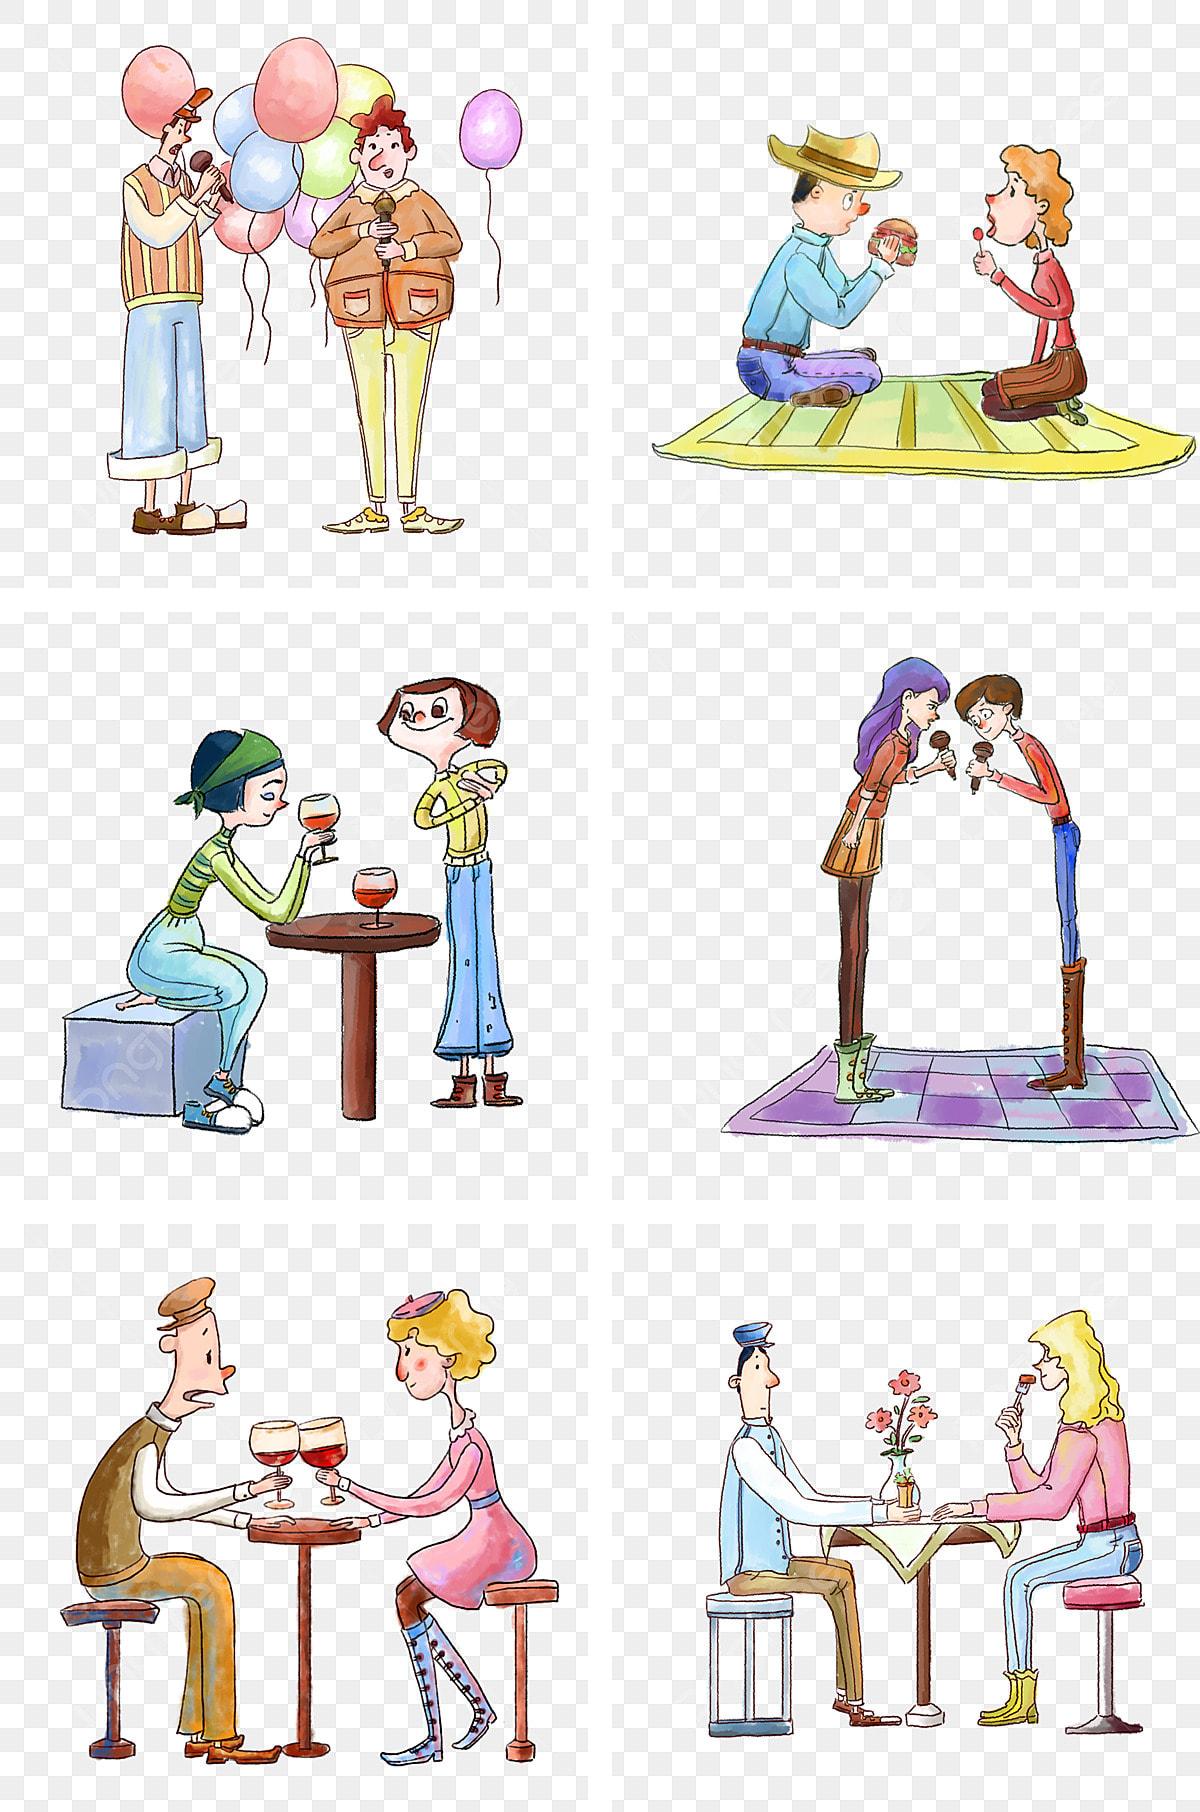 Dibujo Acuarela Color Poster Dibujado A Mano Personaje De Dibujos